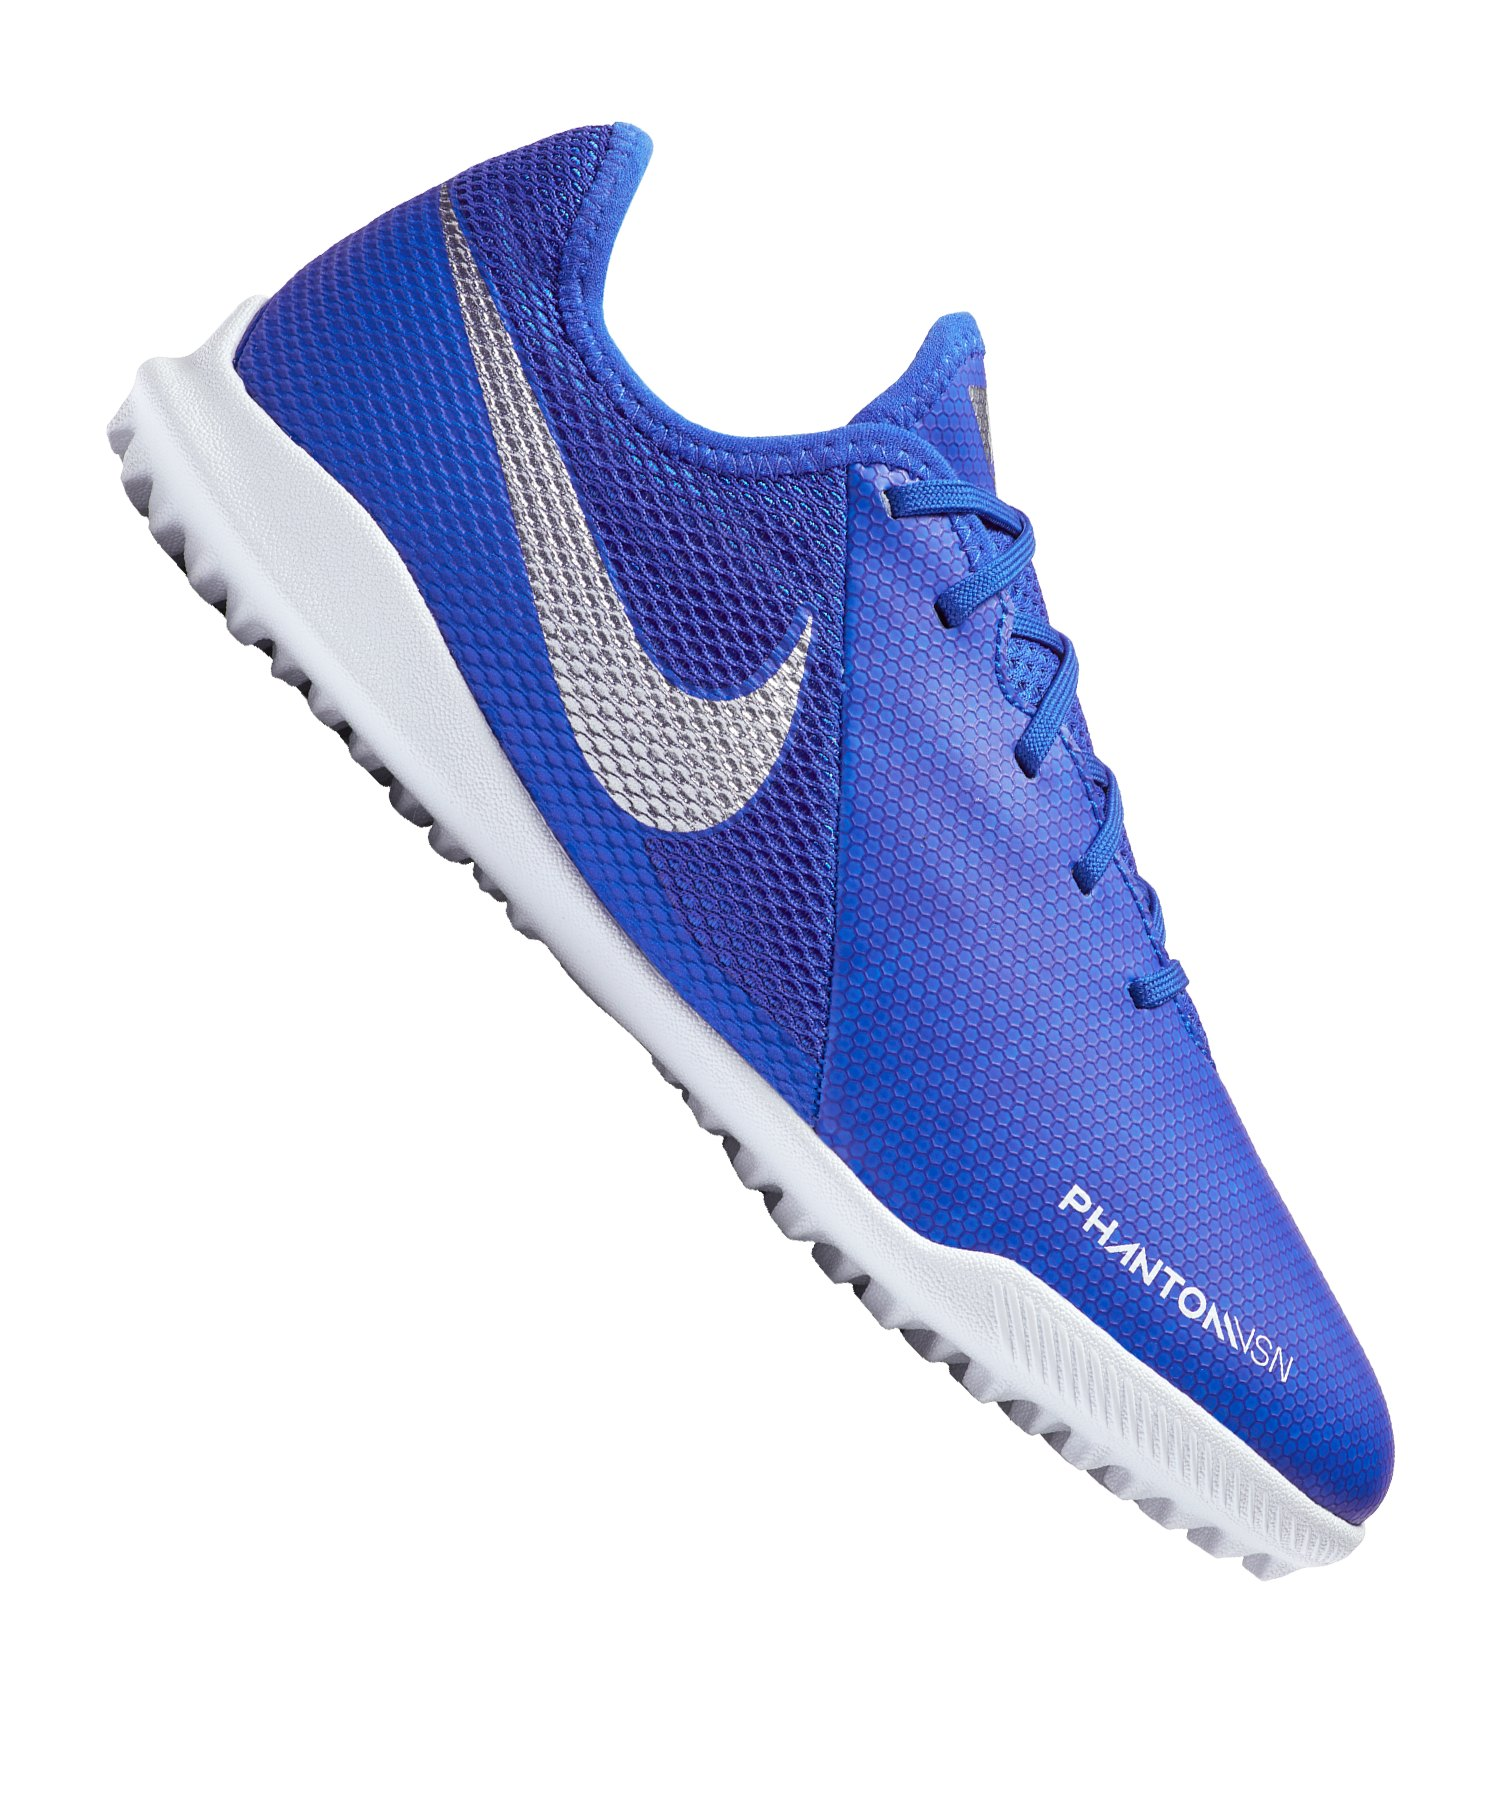 Nike Jr Phantom Vision Academy TF Kids Blau F410 - Blau